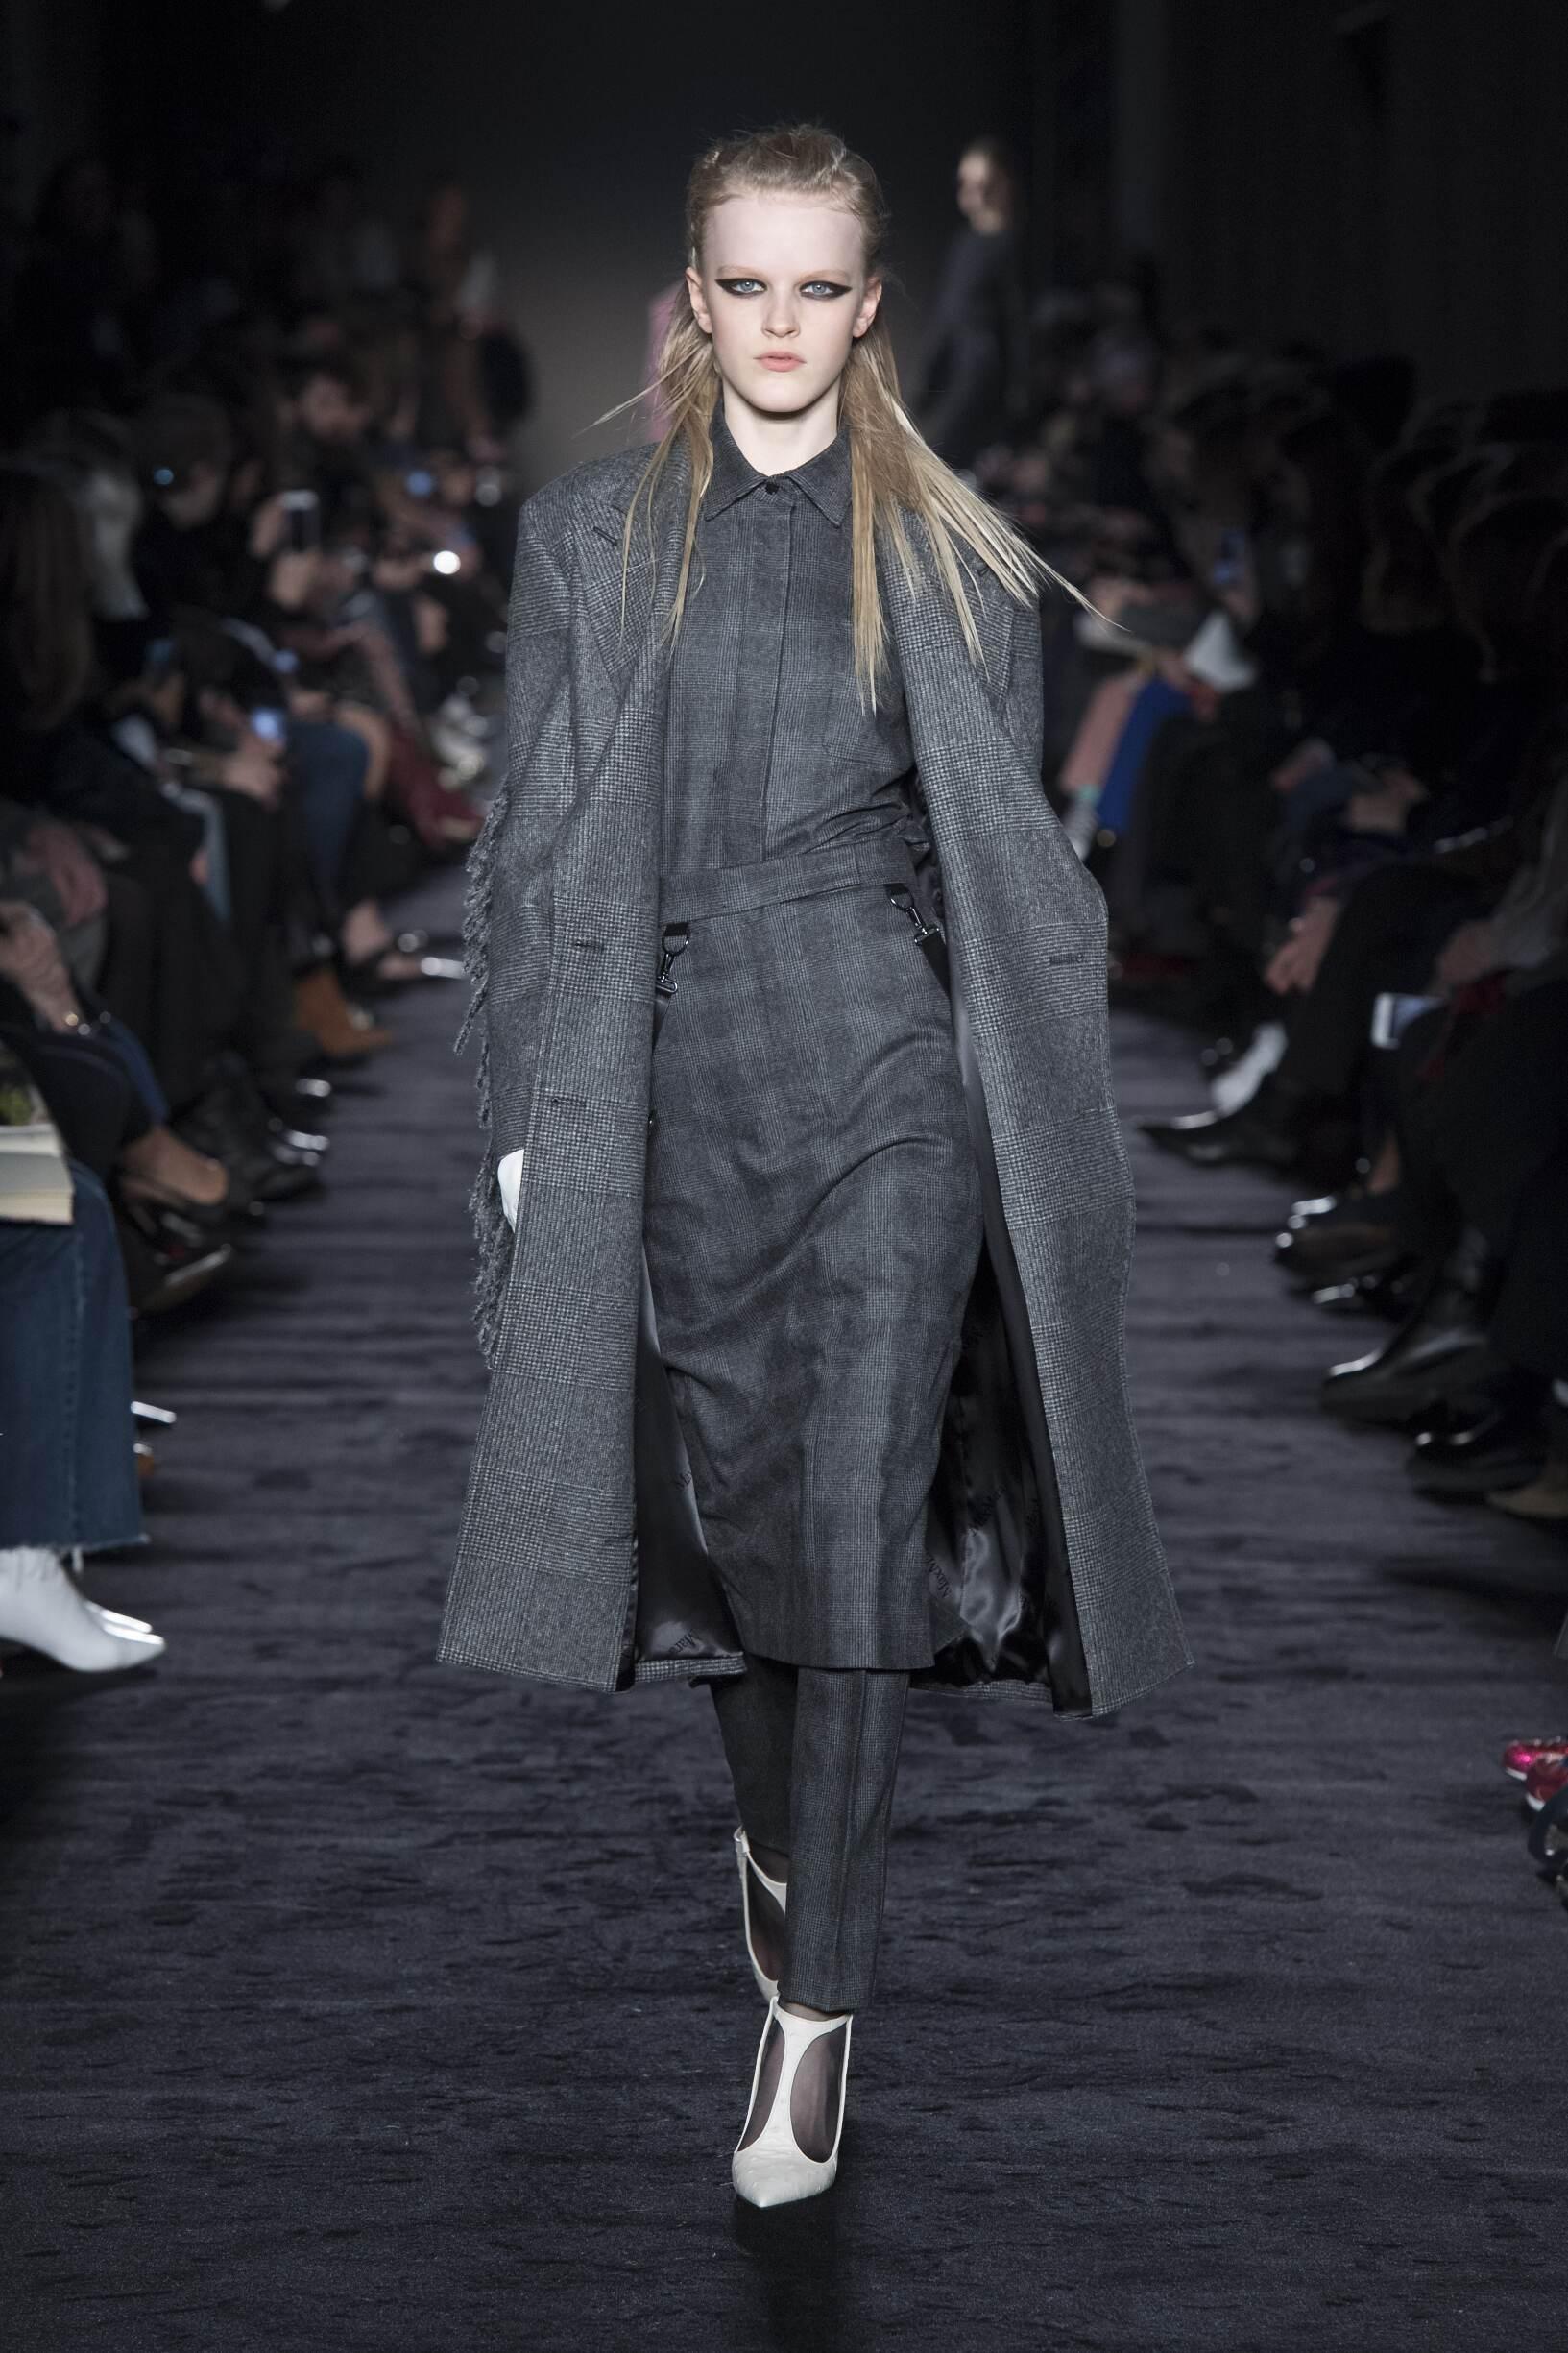 Catwalk Max Mara Woman Fashion Show Winter 2018